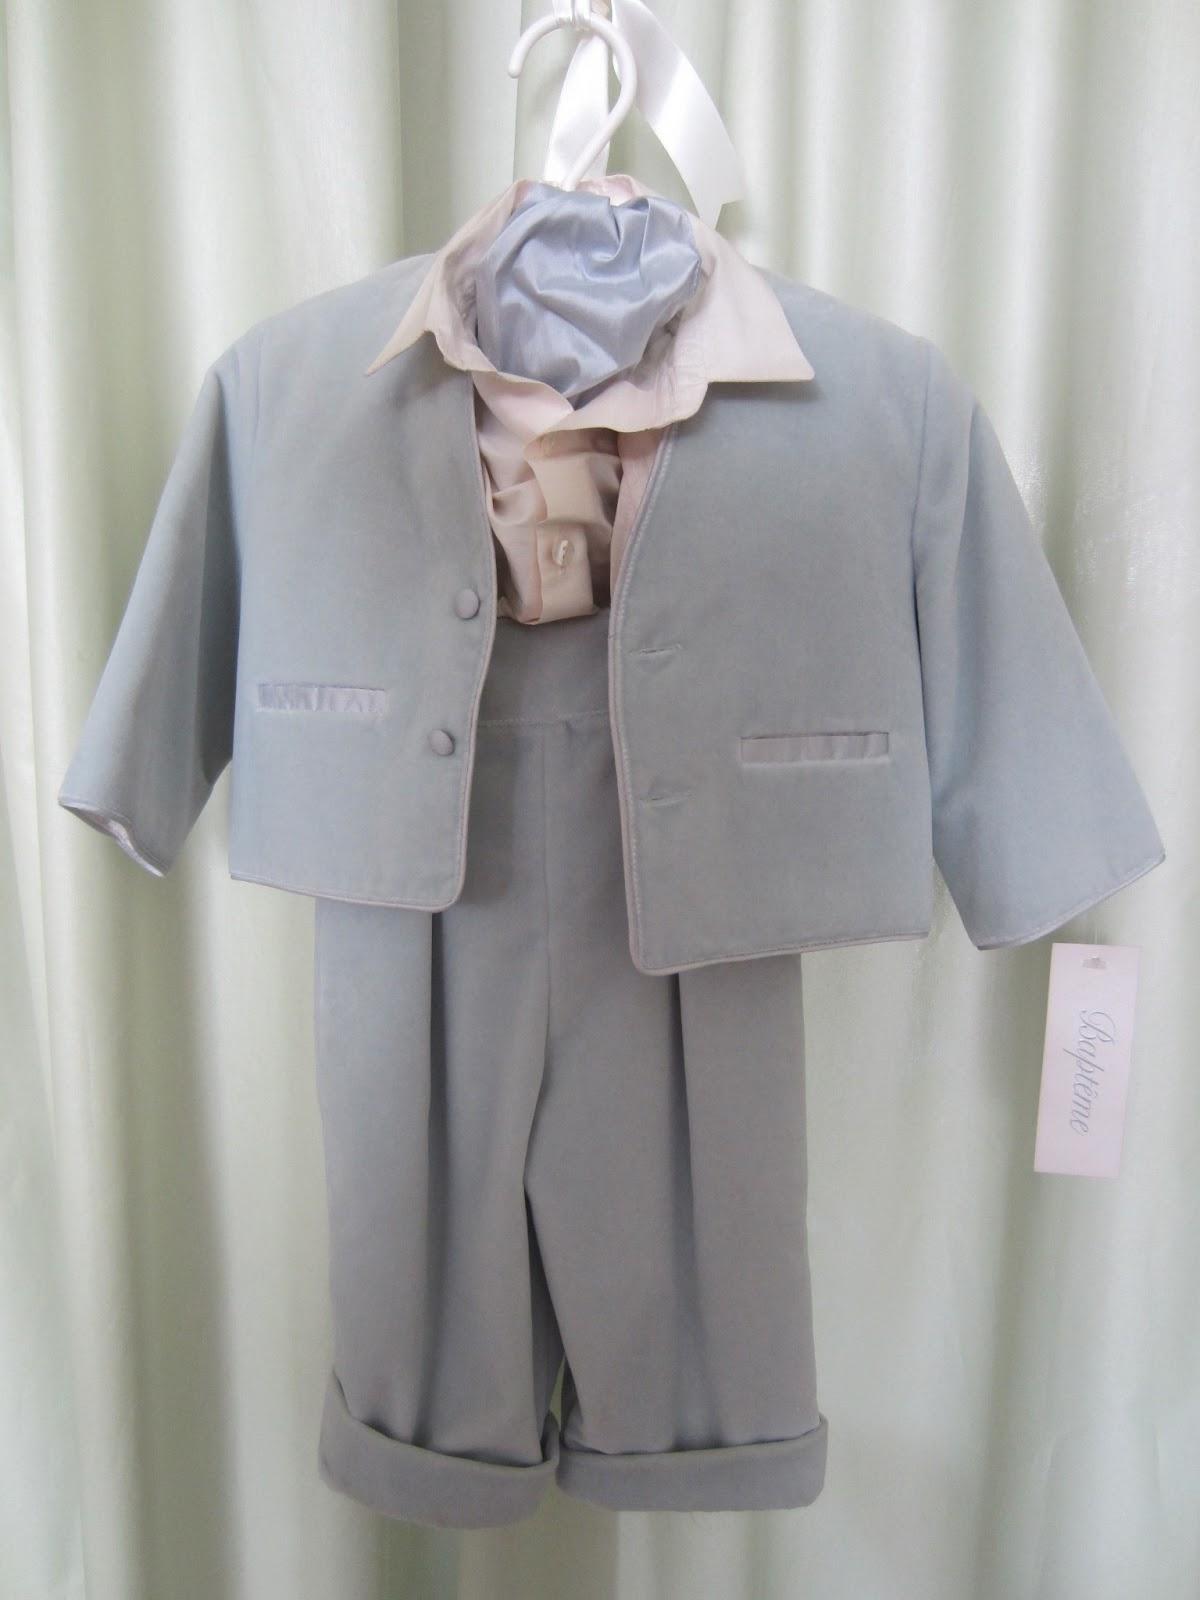 a8ff220803b βελούδινο γαλάζιο κουστούμι με μεταξωτό πουκάμισο και φουλάρι. Τιμή: 60  ευρώ.